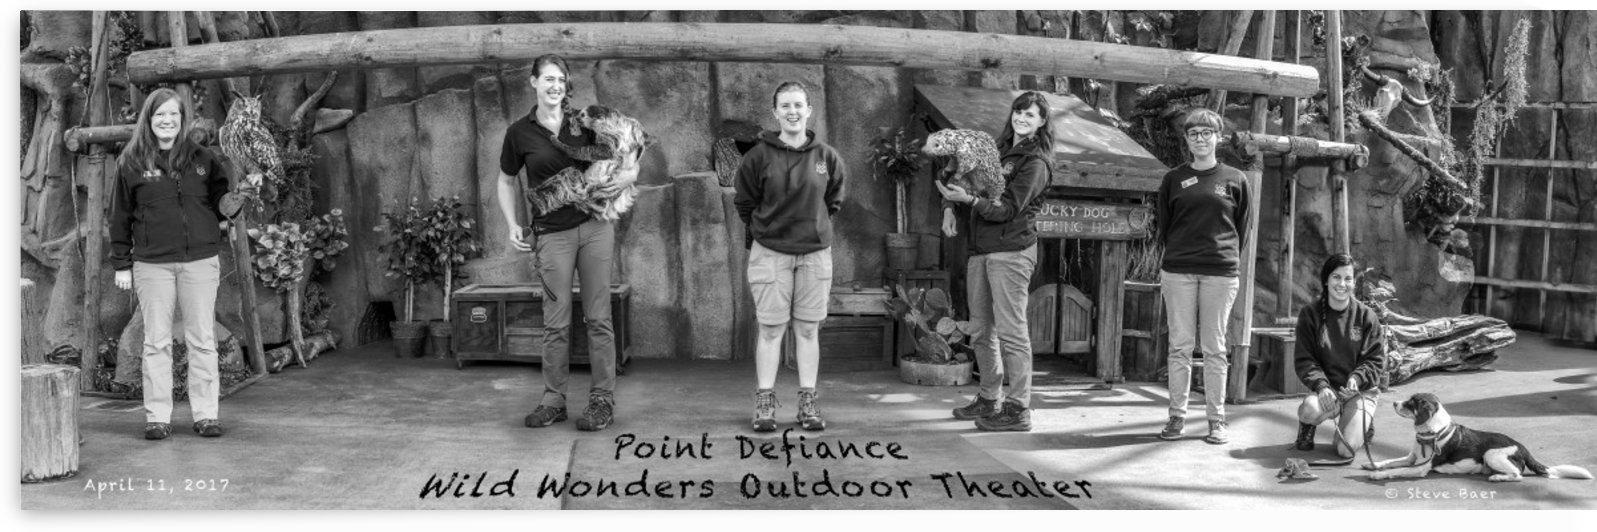 Point Definace Zoo  by Steve